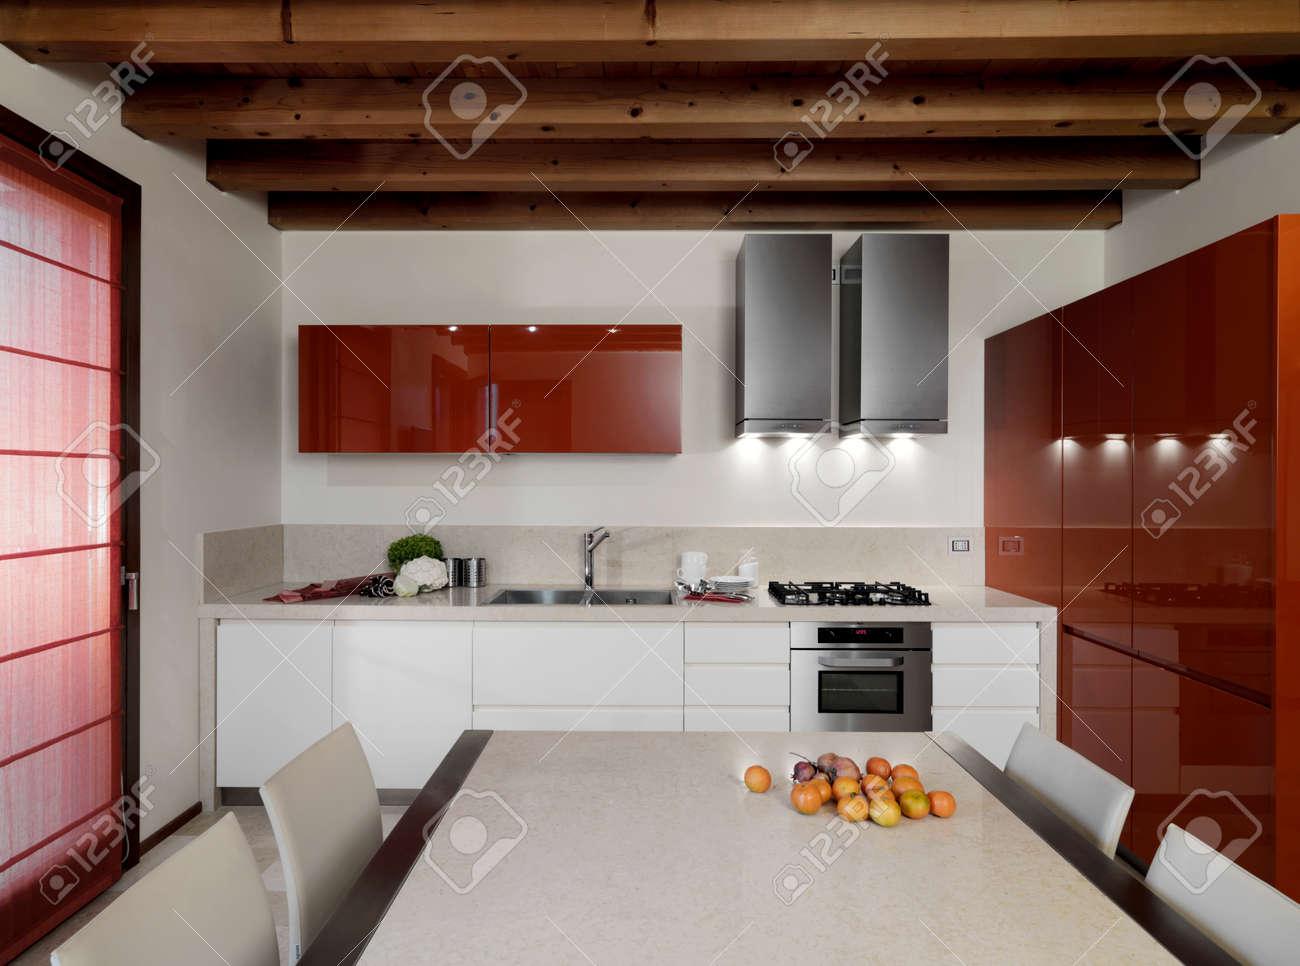 Beautiful Pitturare Una Cucina Contemporary - bakeroffroad.us ...